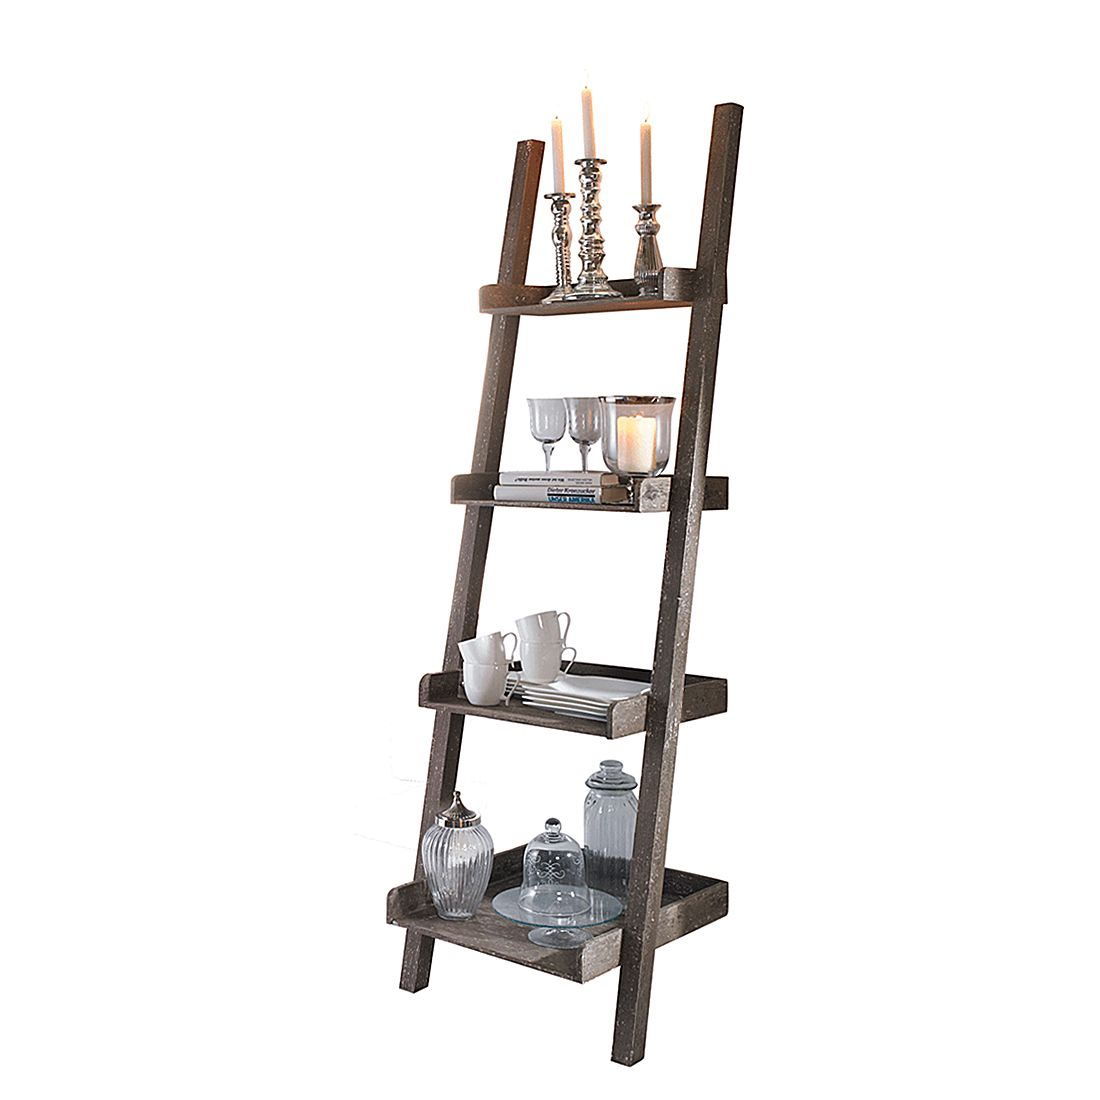 Wandlehnregal Used Look – Holz – Braun, PureDay kaufen